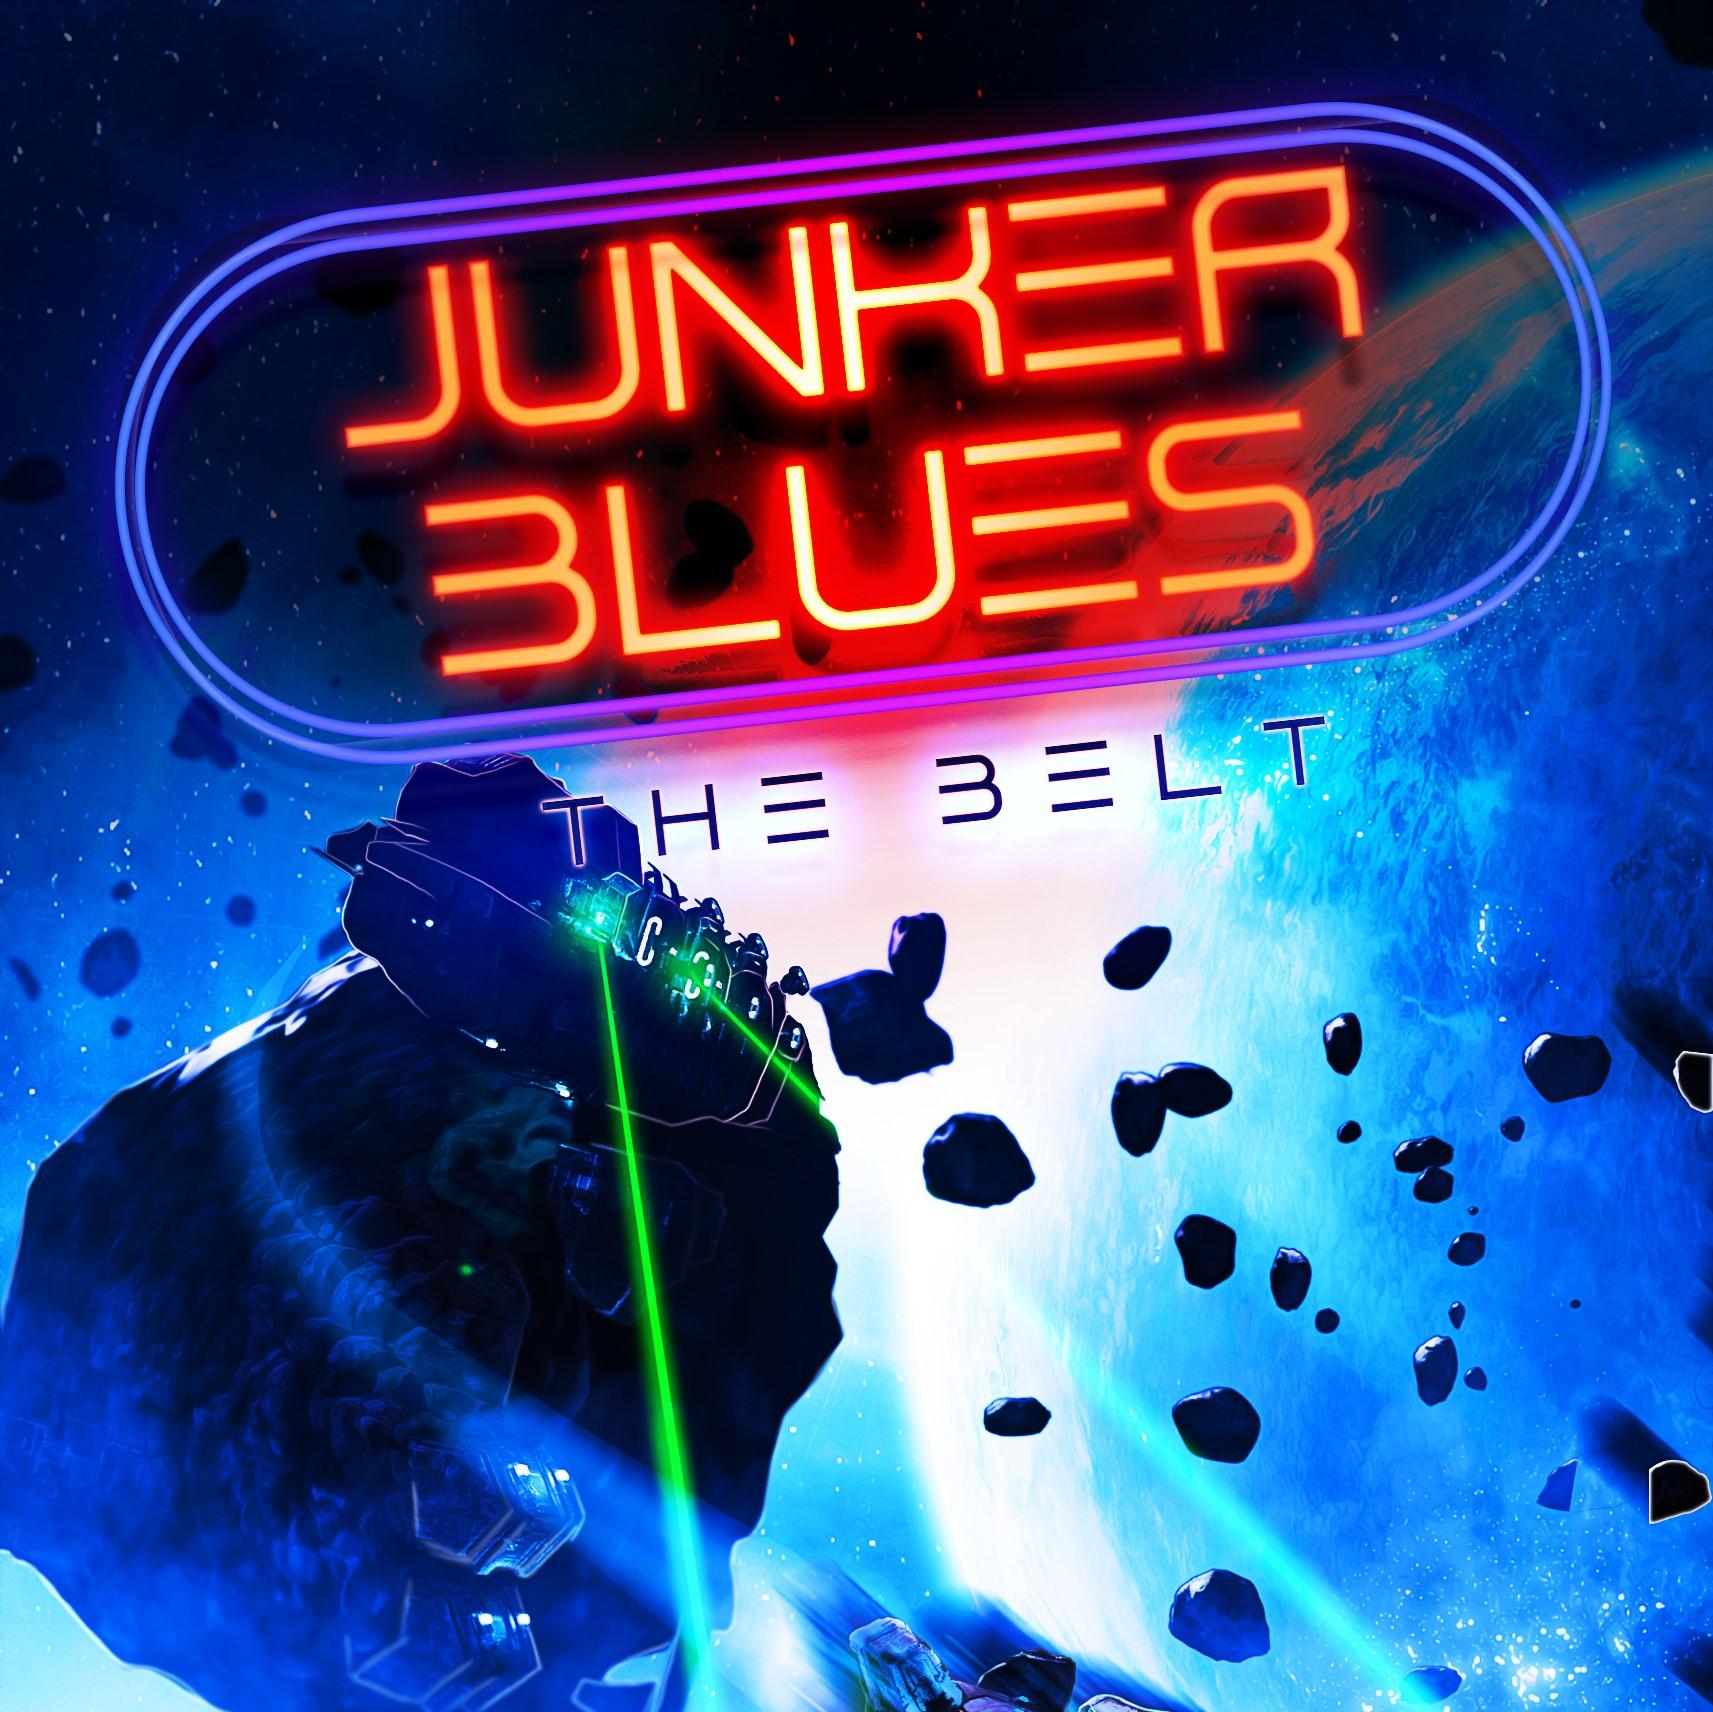 Junker Blues: Lon E. Varnadore Delivers a Sci-Fi Epic